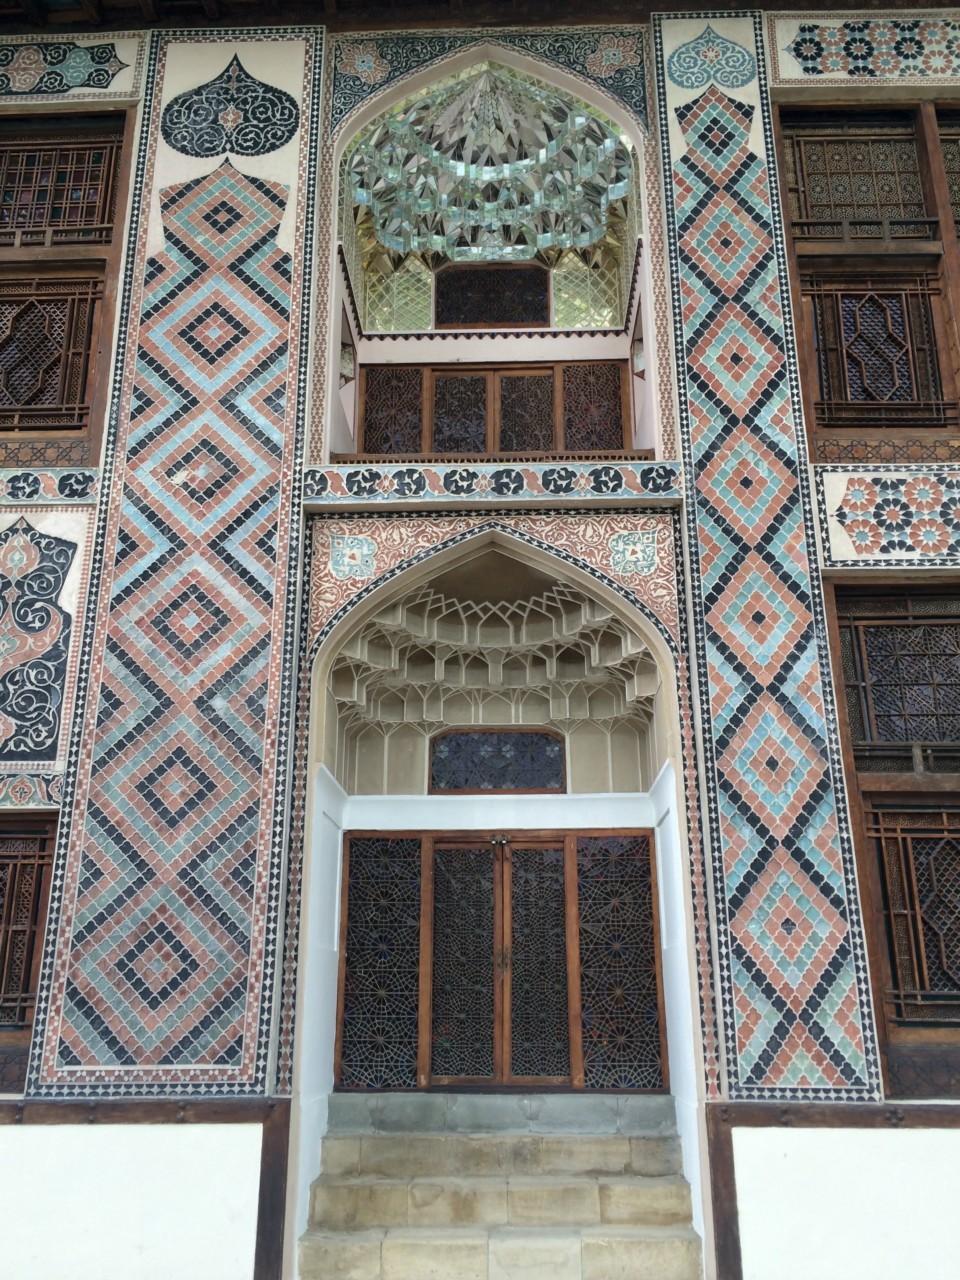 Khansaray windows